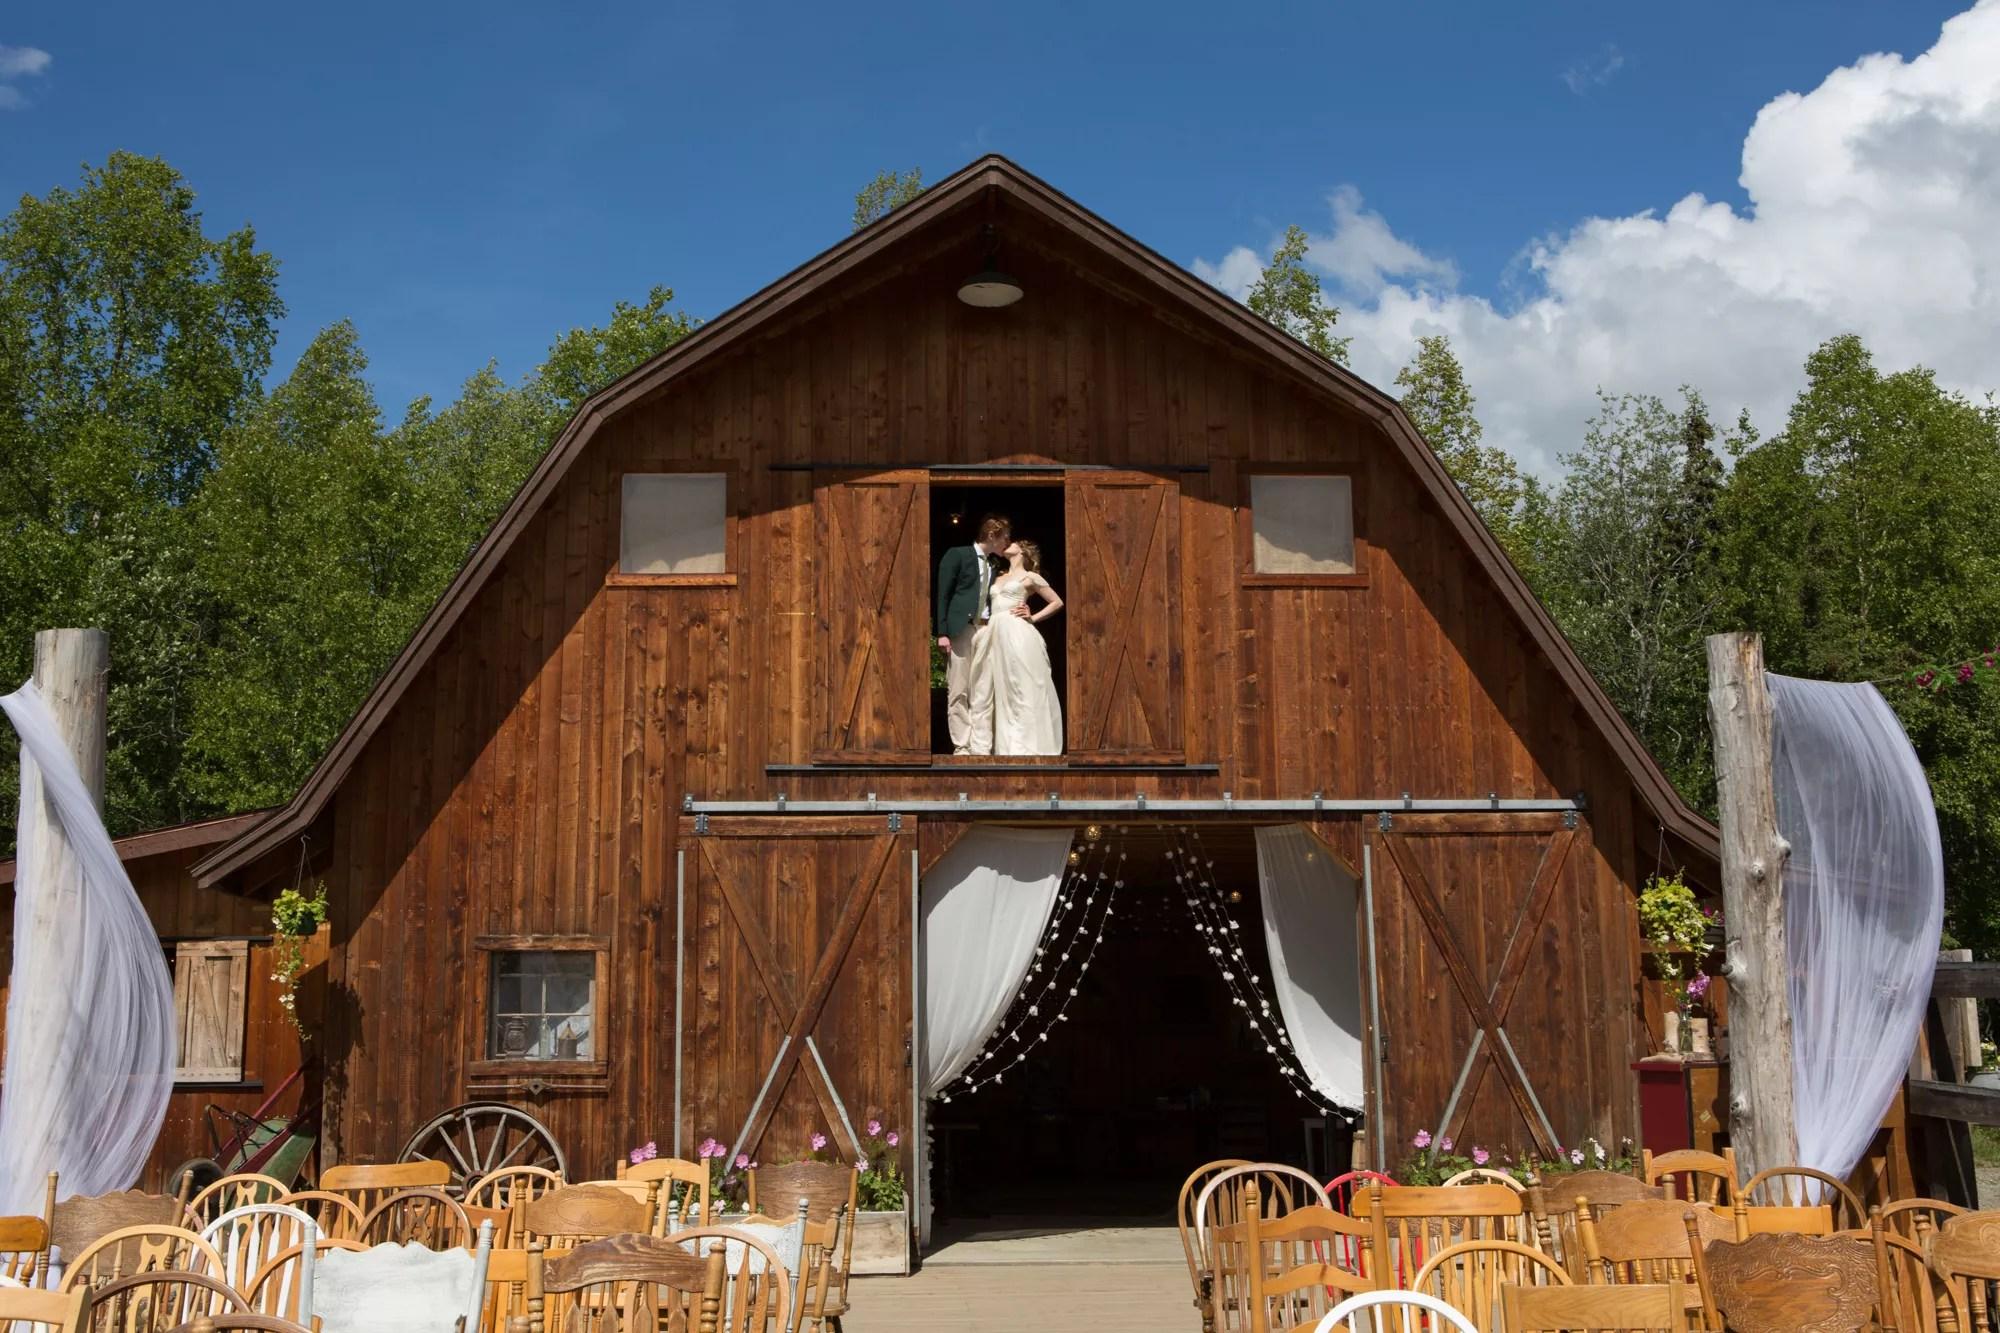 Rustic Brown Barn Wedding Reception Location